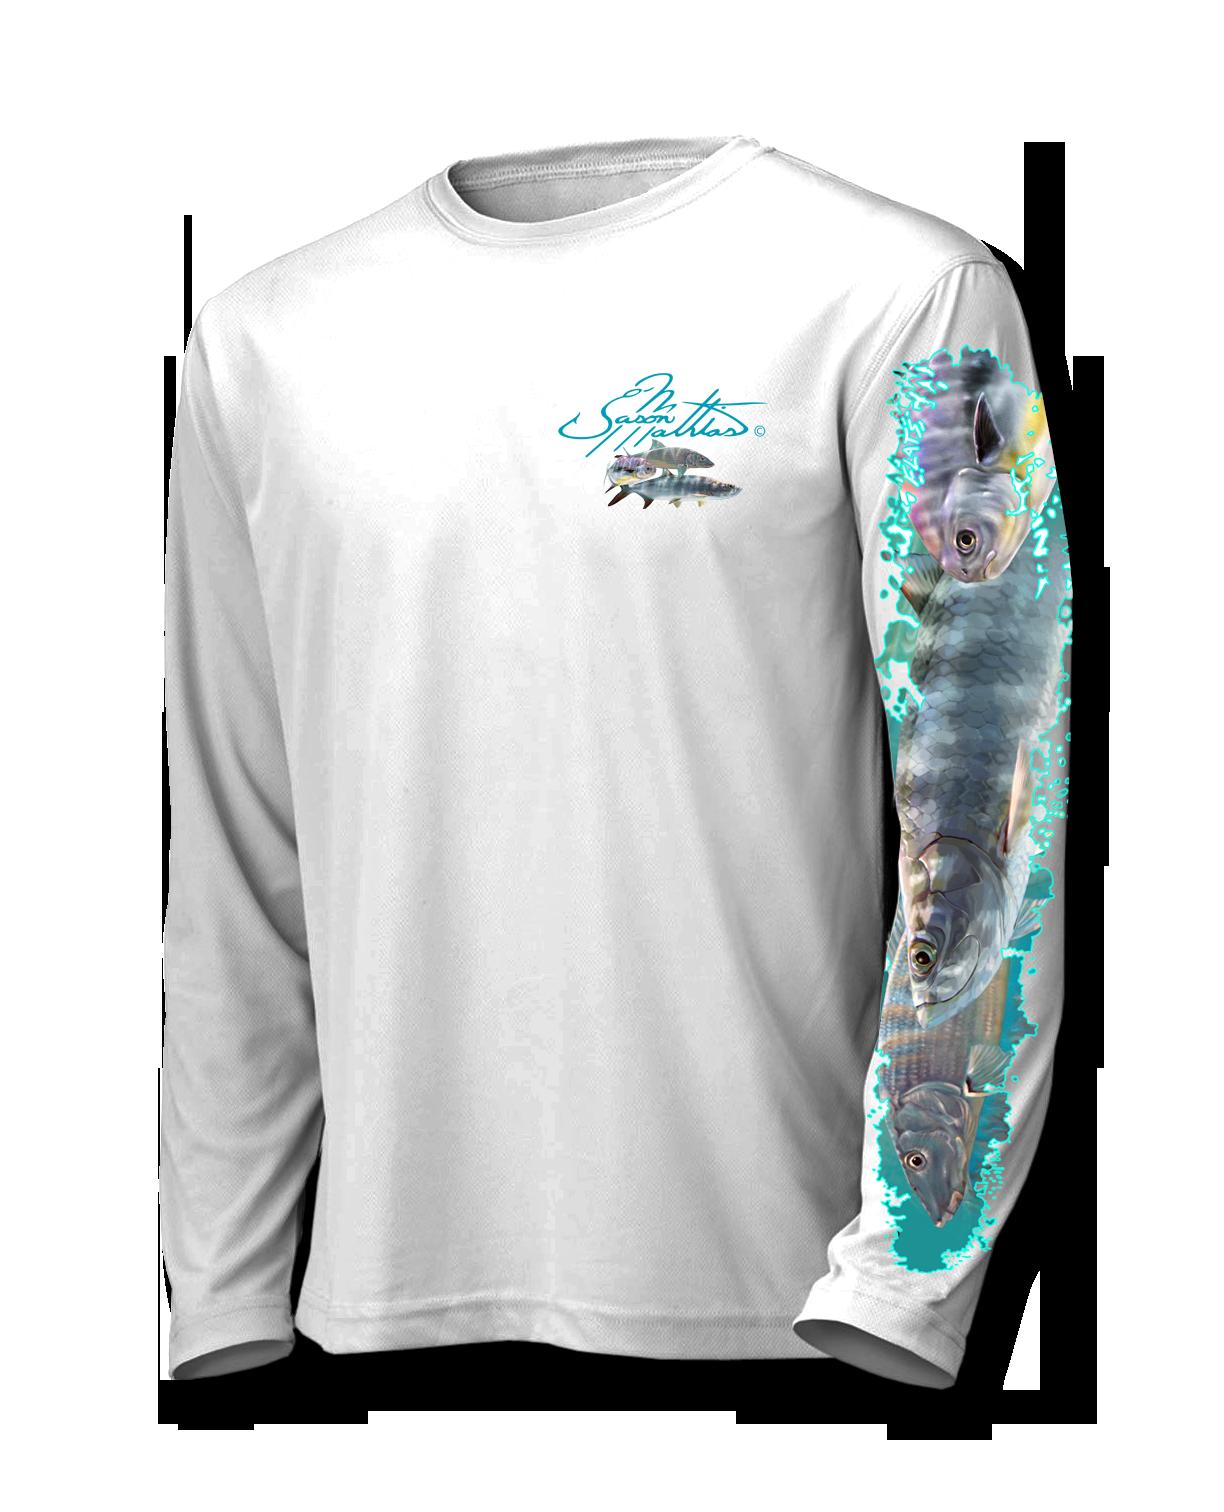 flats-fishing-shirt-front-white-jason-mathias.png